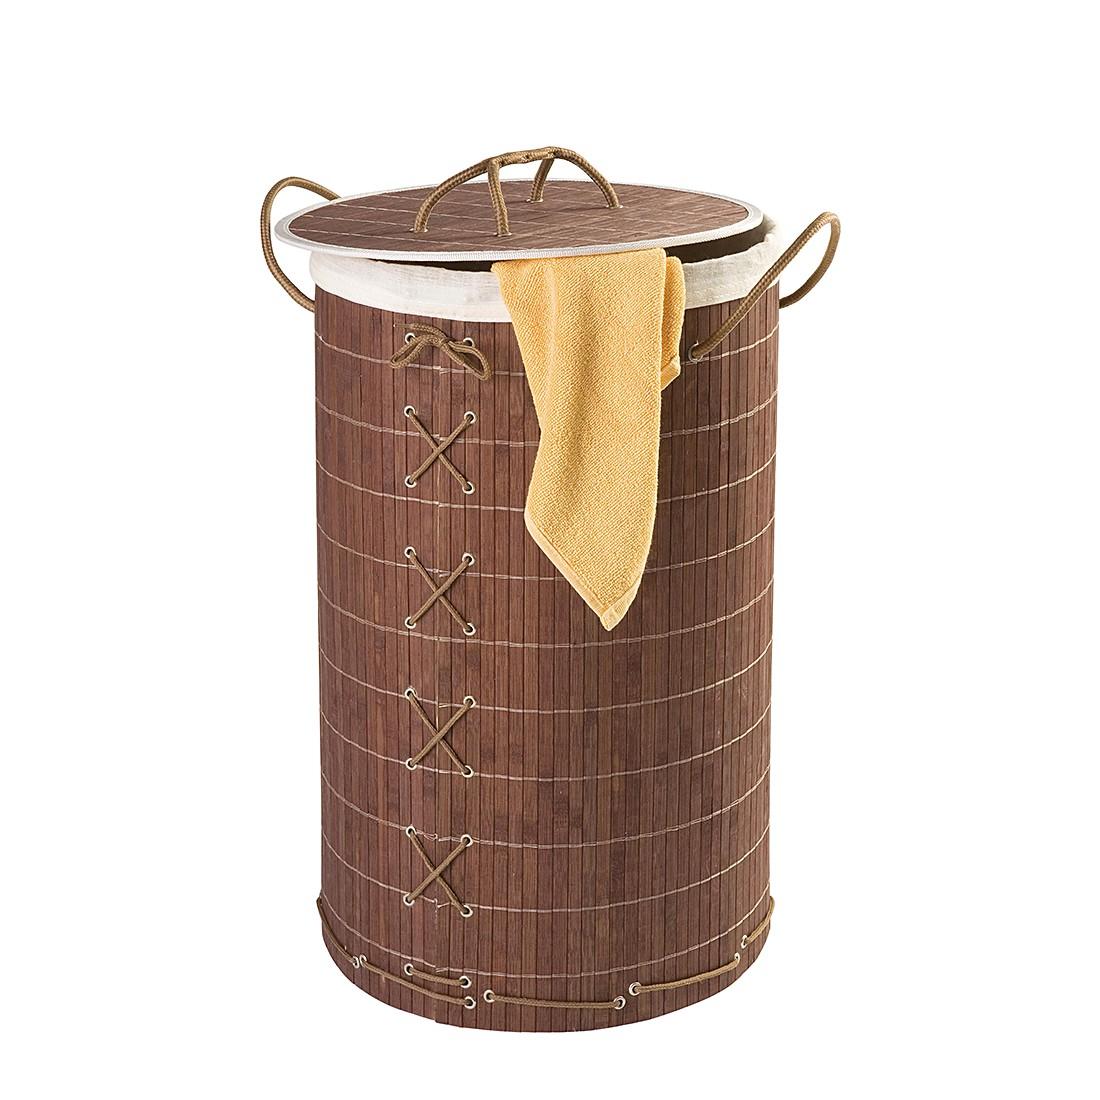 Waeschetruhe Bamboo | Bad > Bad-Accessoires > Sonstige Badaccessoires | Braun | Massivholz | WENKO